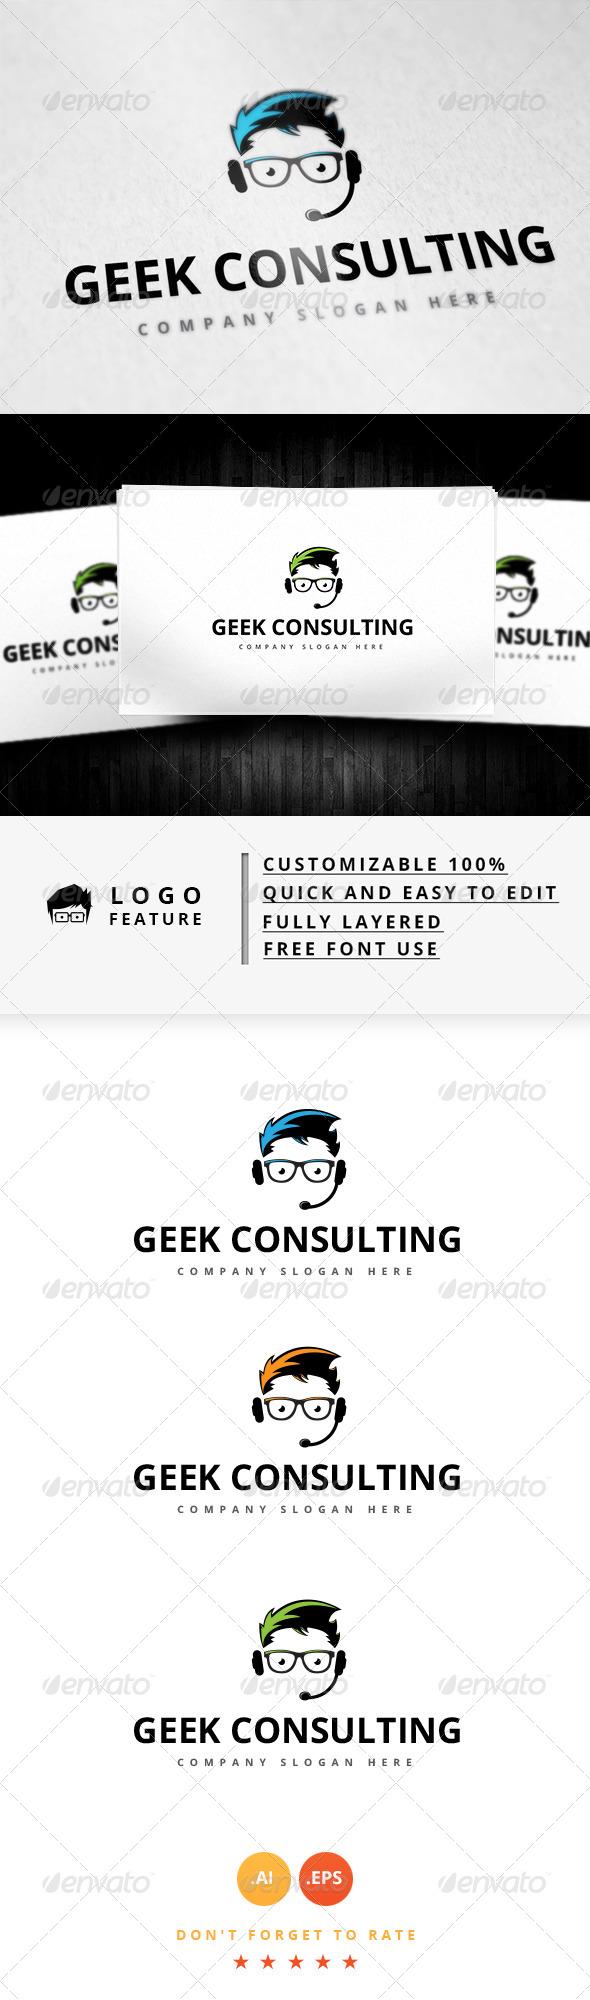 Geek Consulting Logo